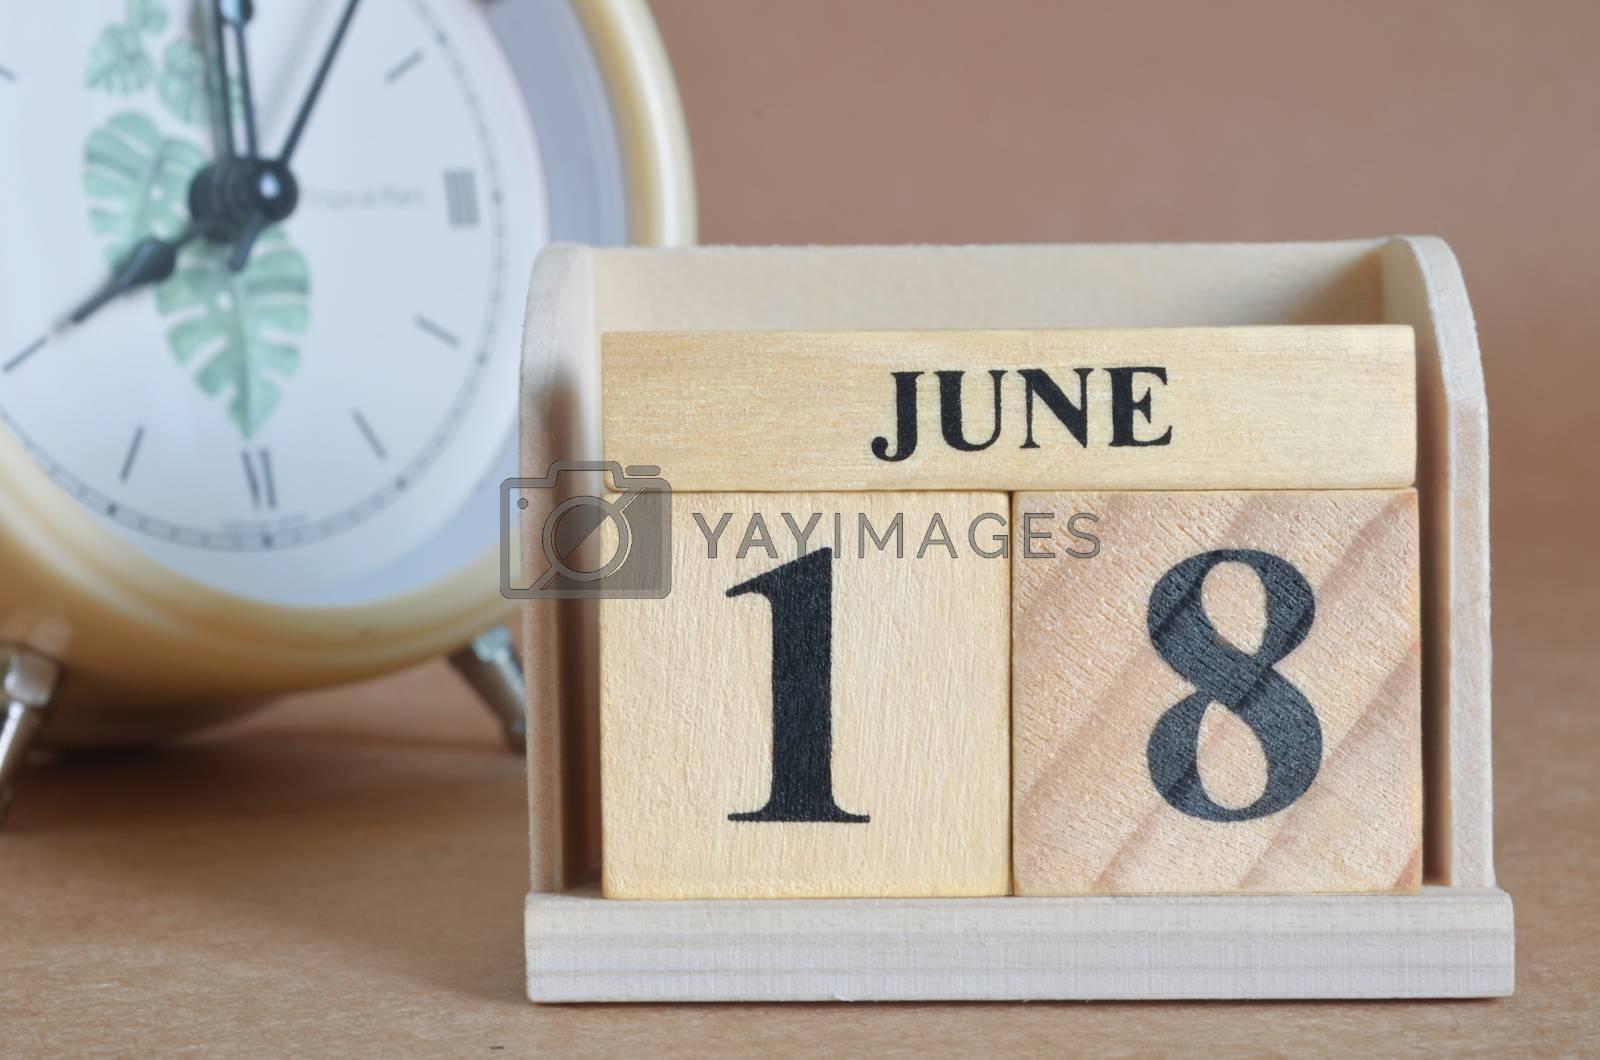 June 18 by Mrfrost